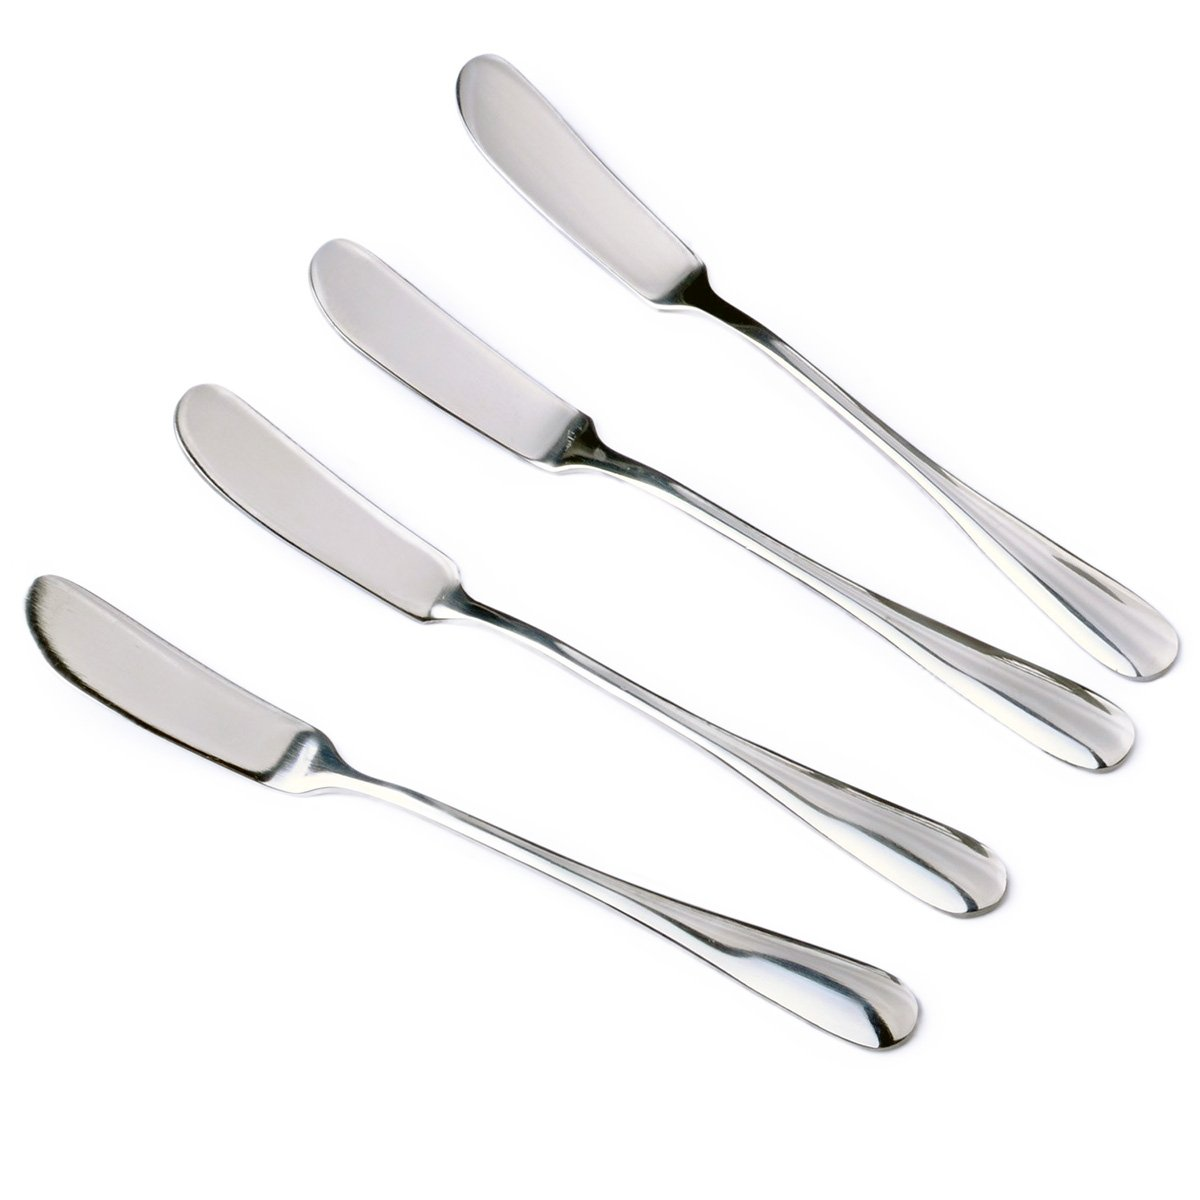 Zelta Stainless Steel Spreaders Silver, Packs of 4